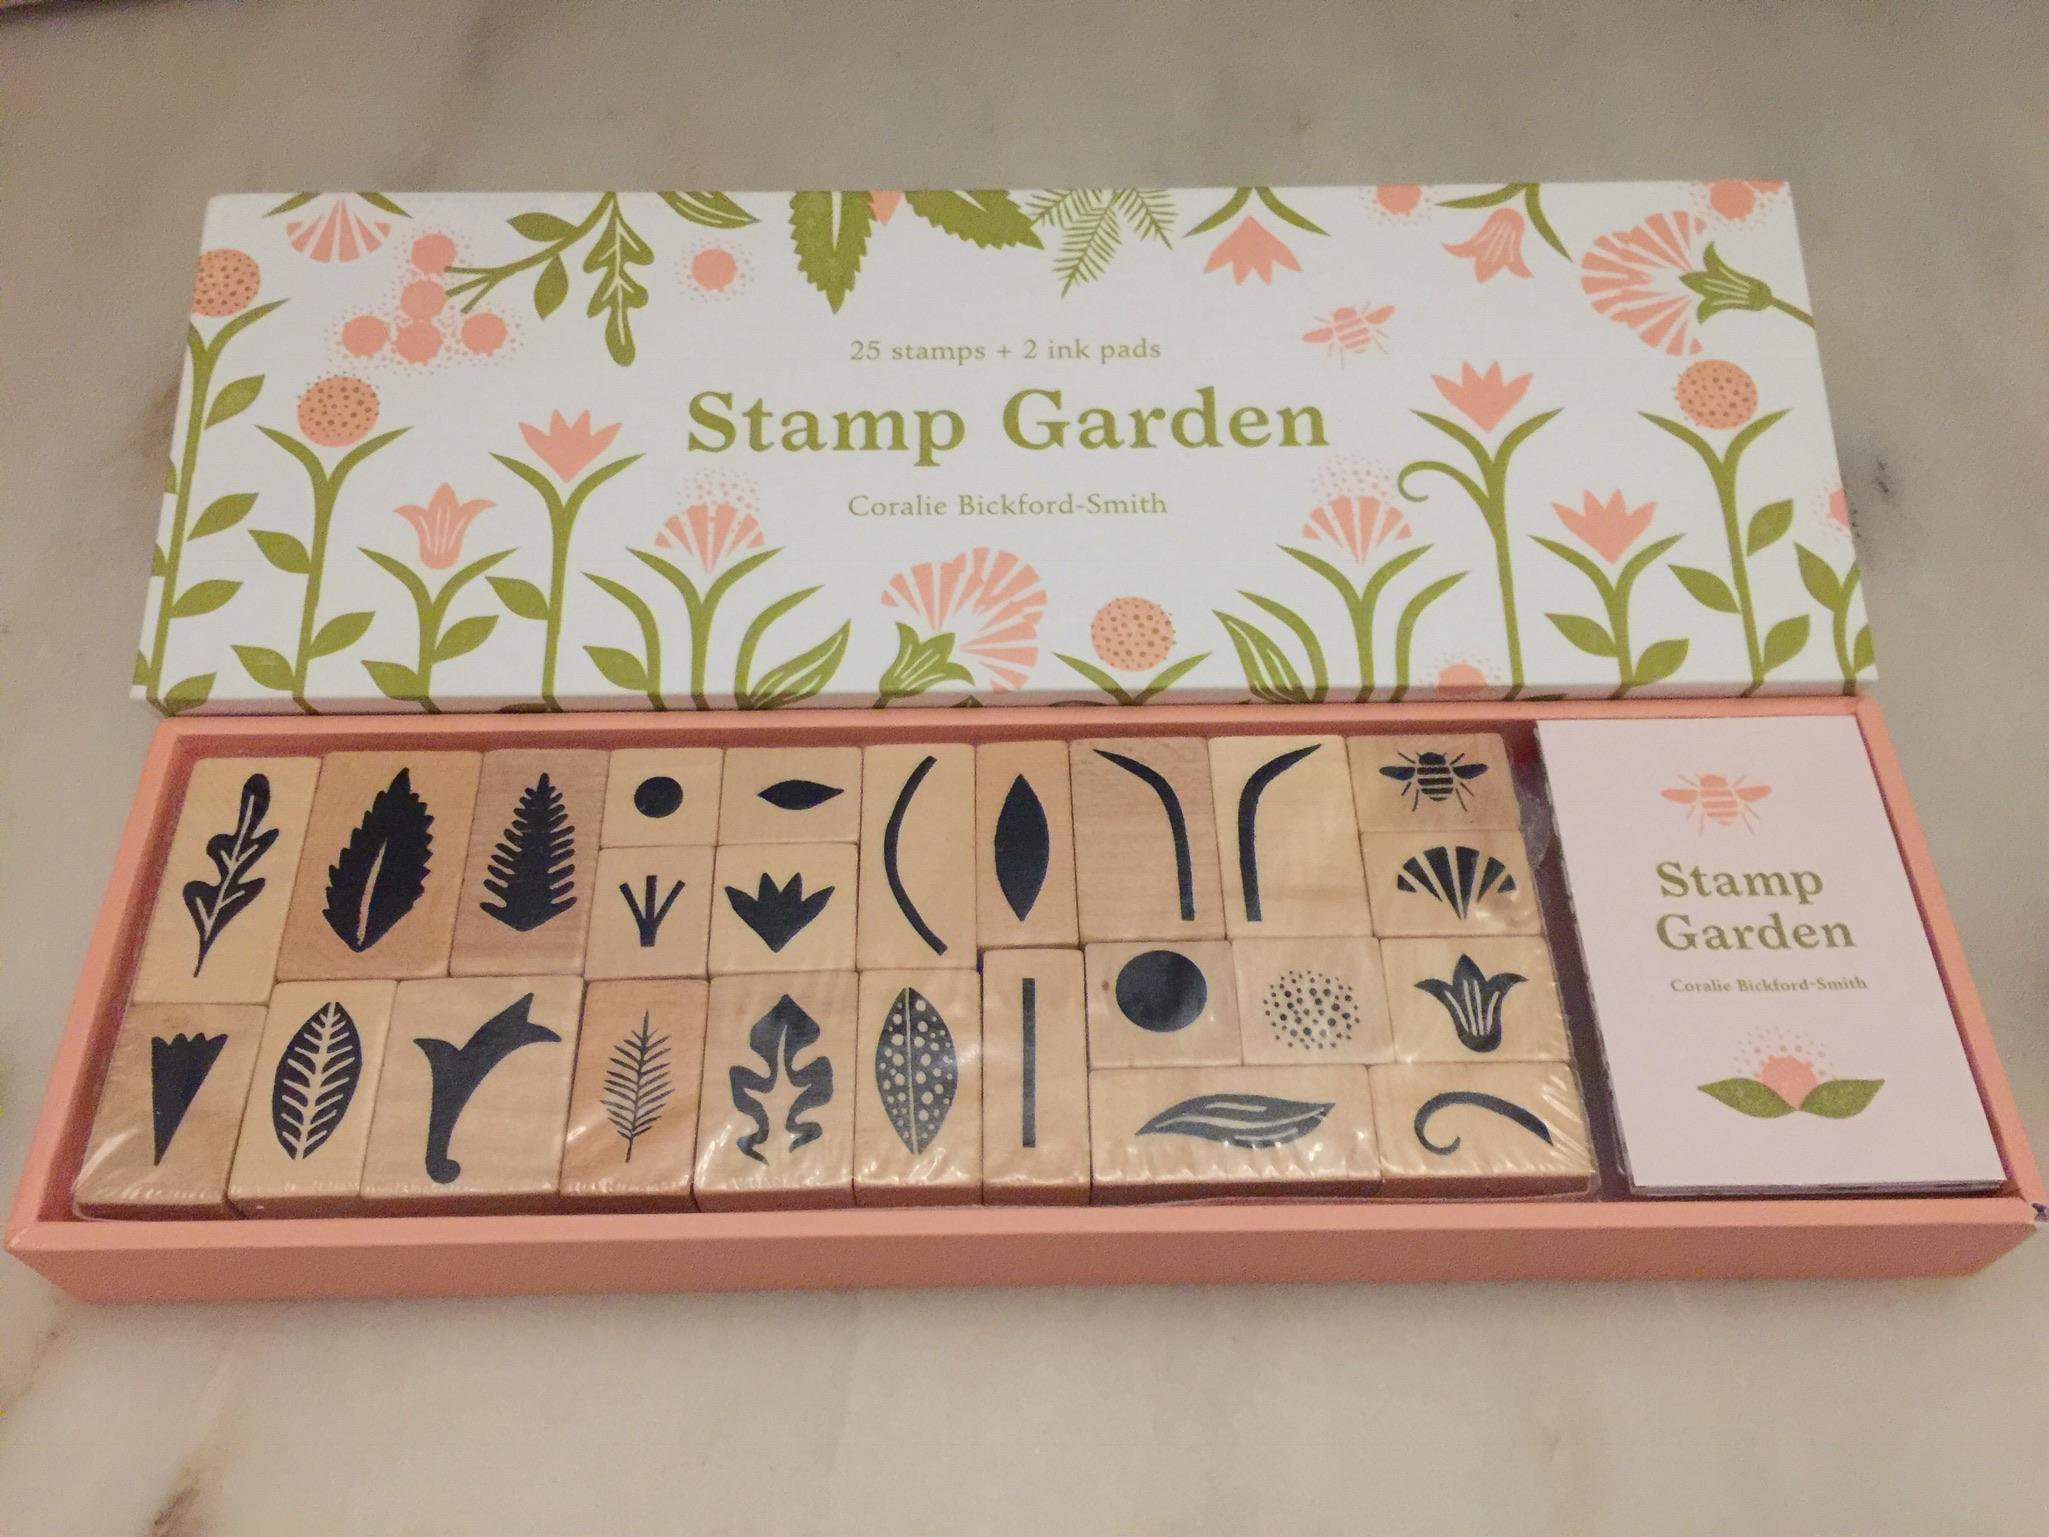 Stamp Garden Princeton Press Gardener Mom gift.jpg